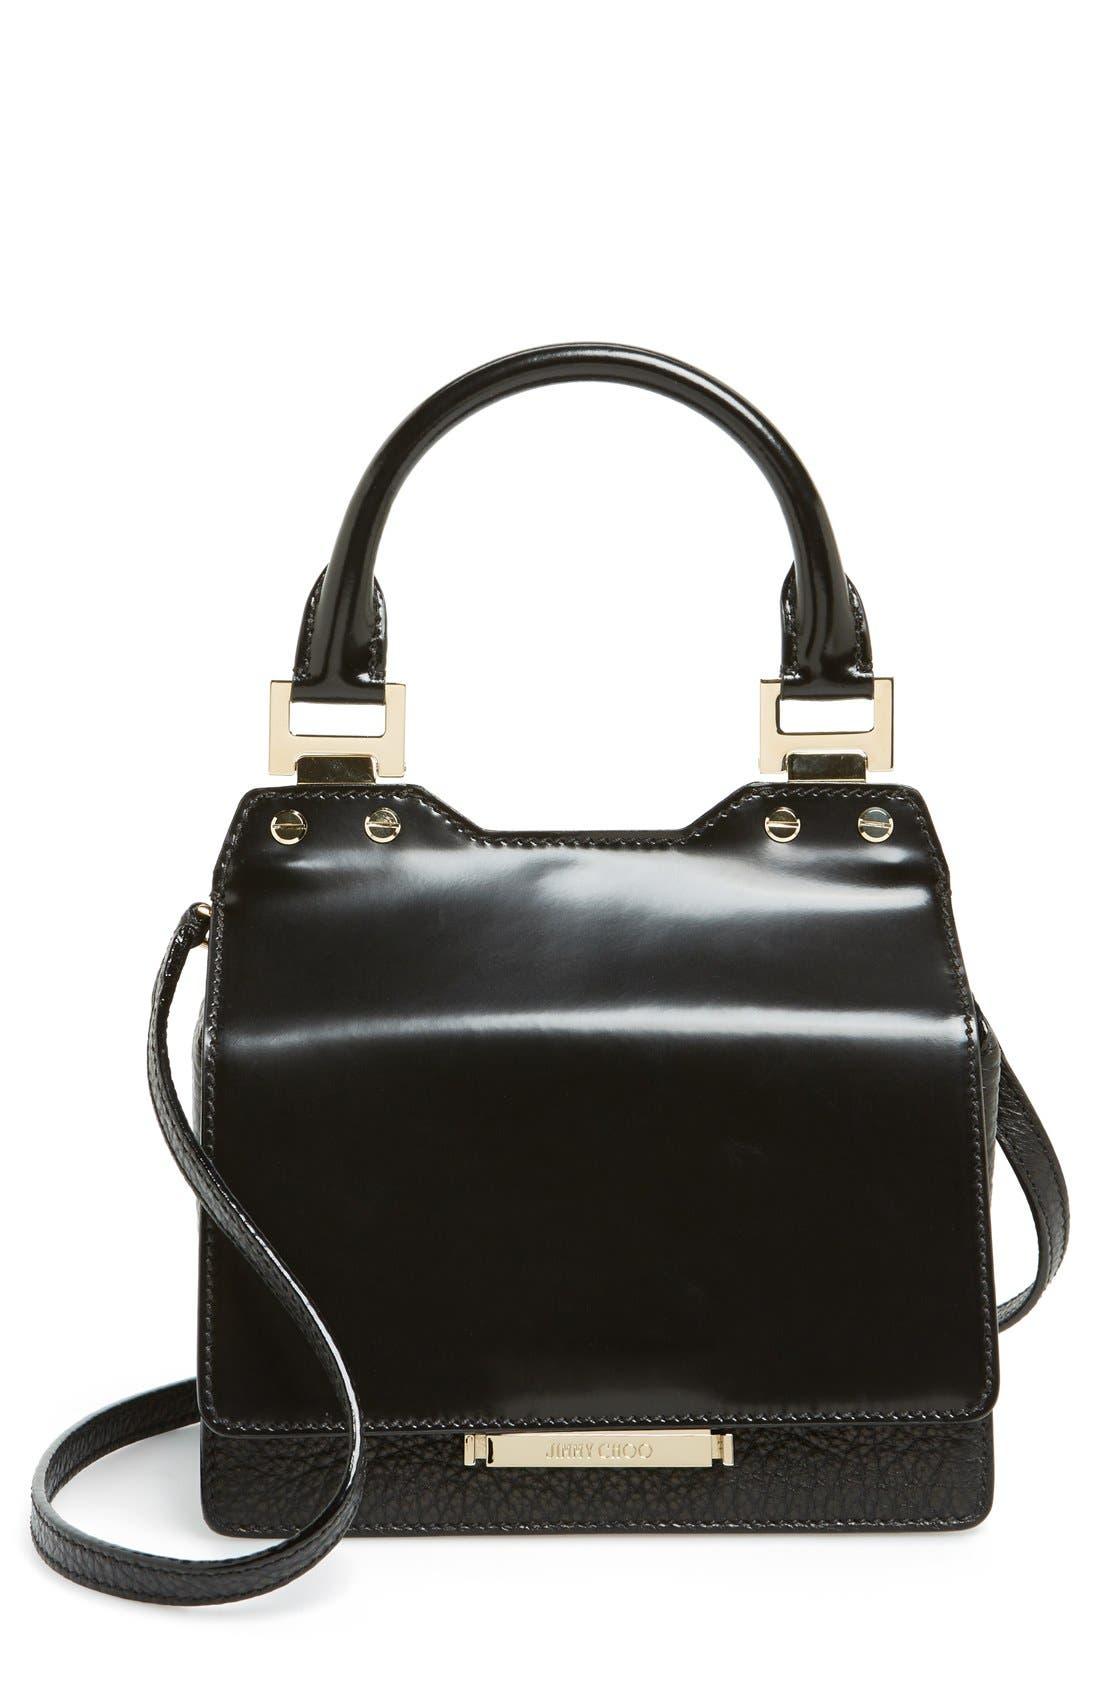 Main Image - Jimmy Choo 'Amie' Top Handle Leather Satchel